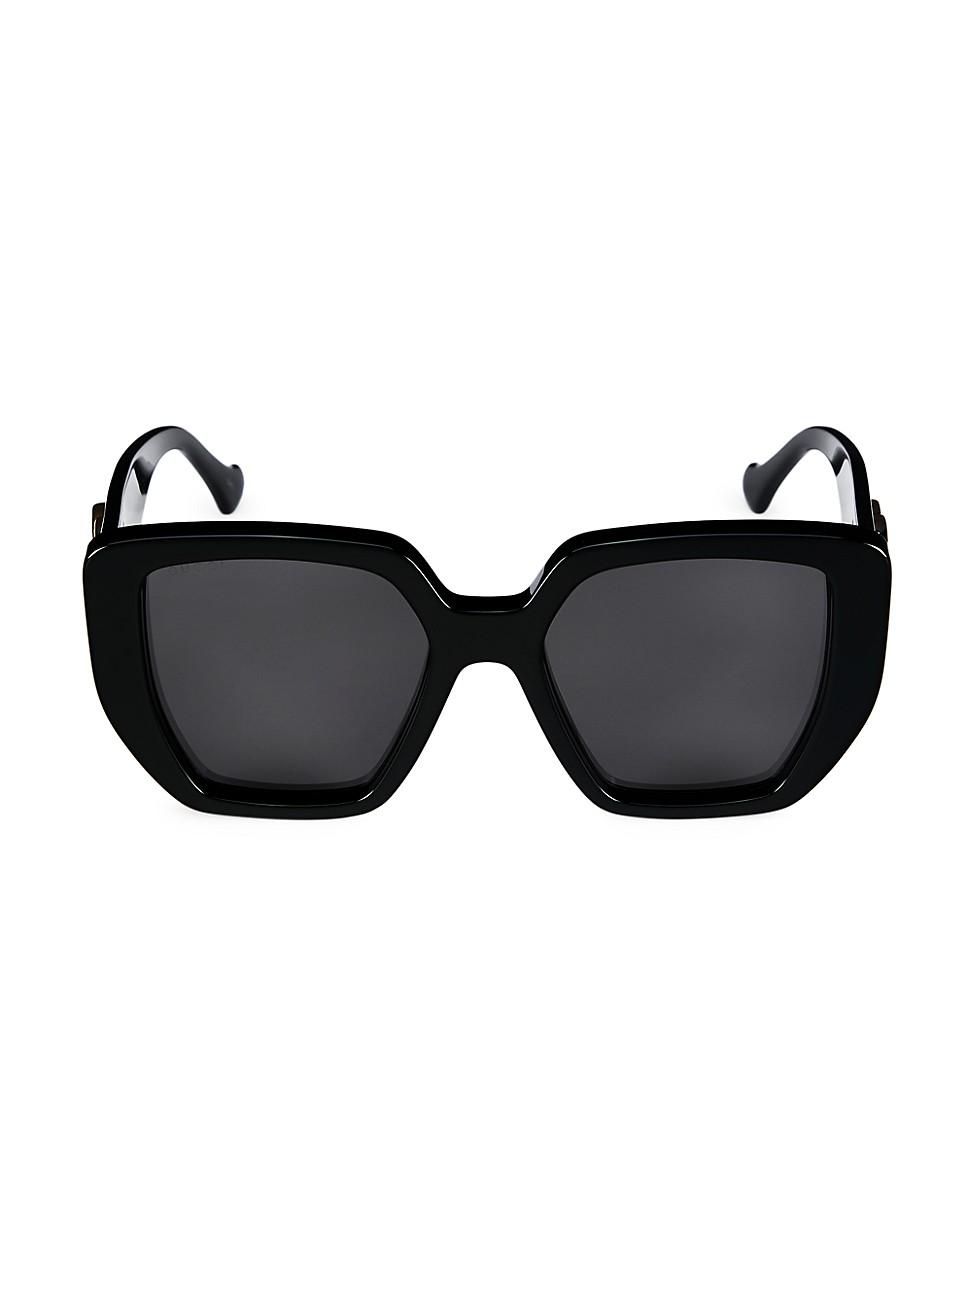 Gucci Generation 54mm Oversized Rectangular Sunglasses In Black